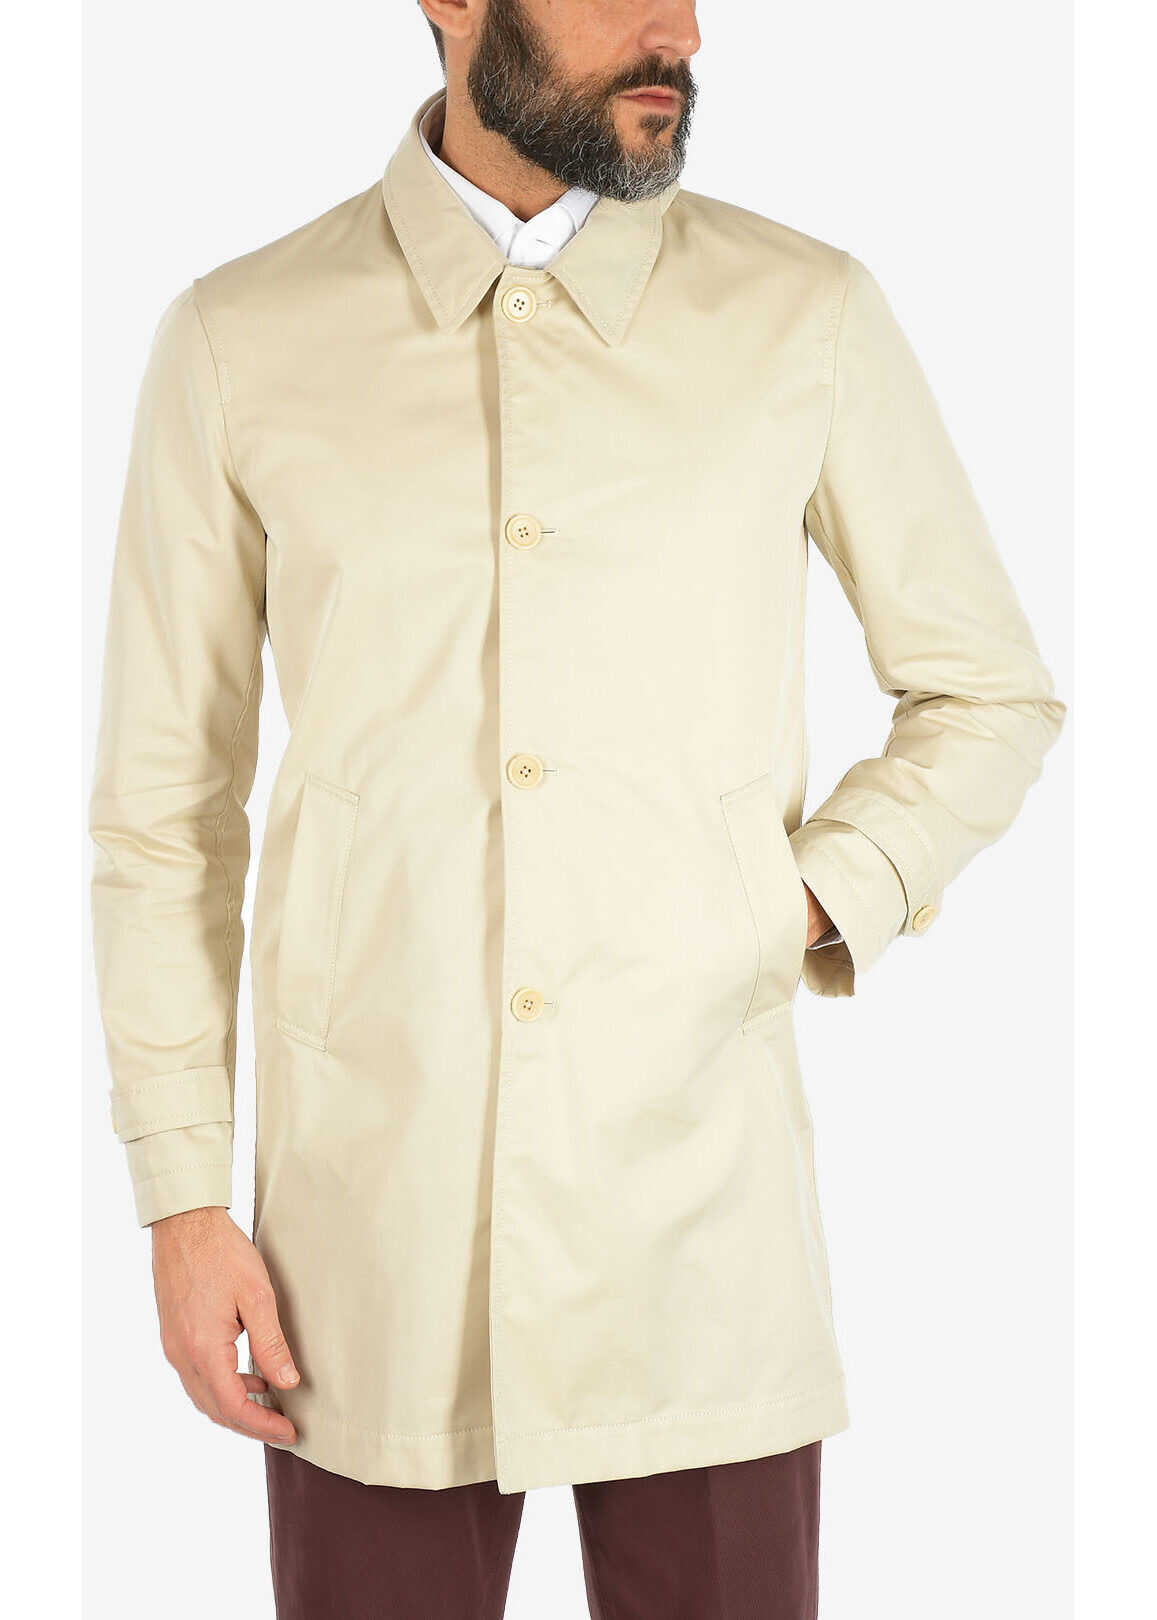 CORNELIANI CC COLLECTION zipped coat BEIGE imagine